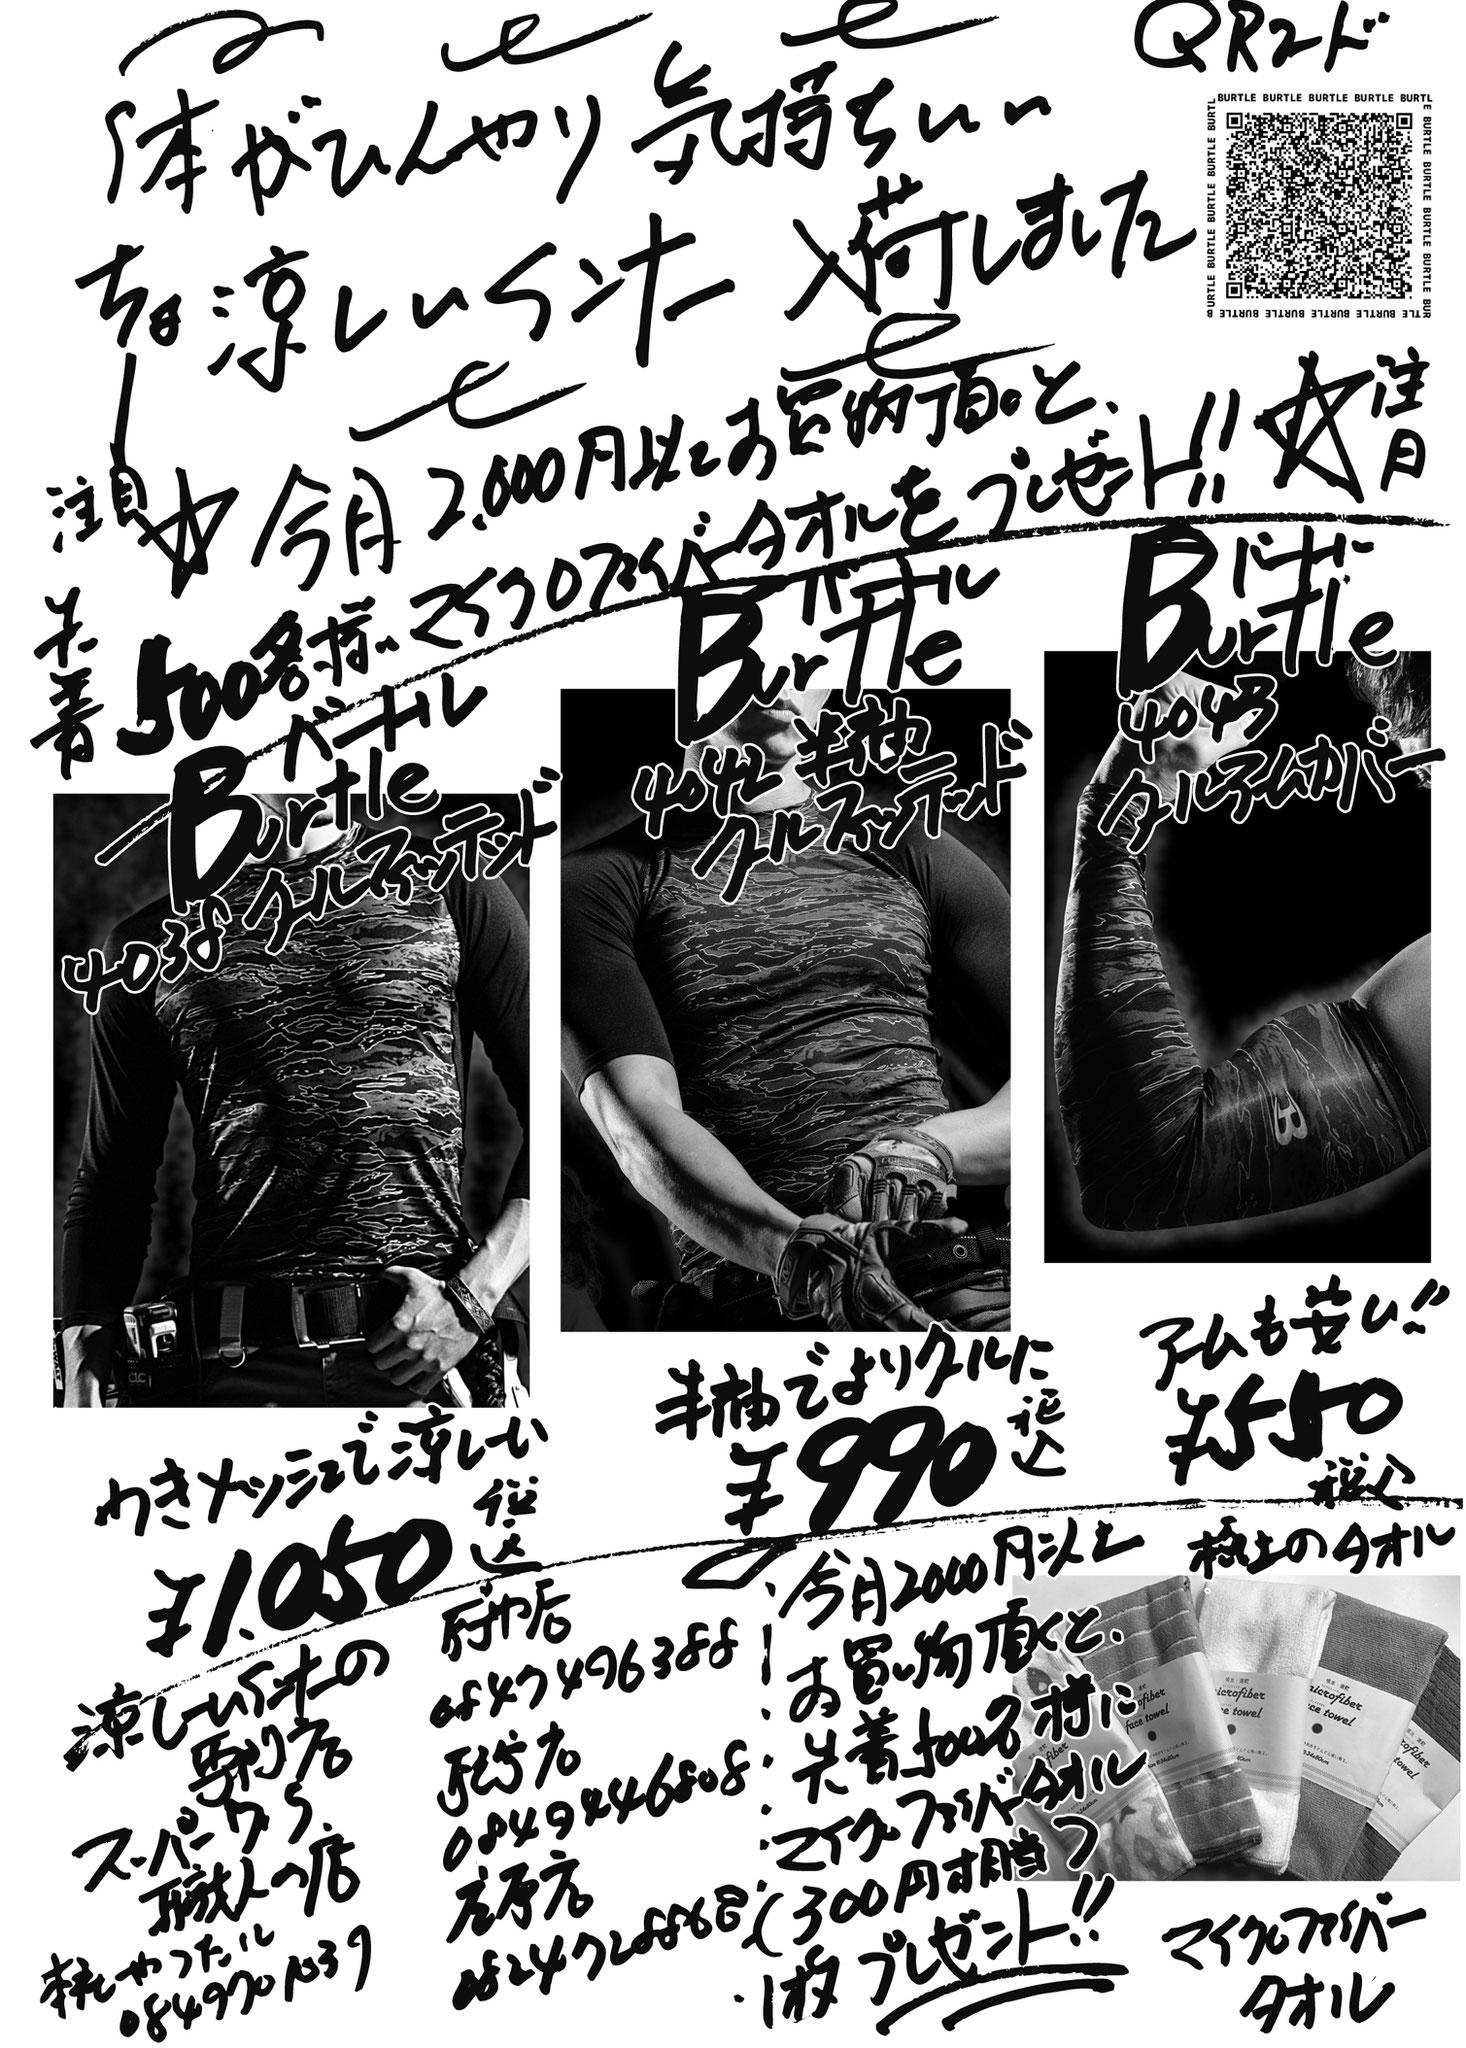 BURTLE~バートル~のインナーが今年のおススメ!!